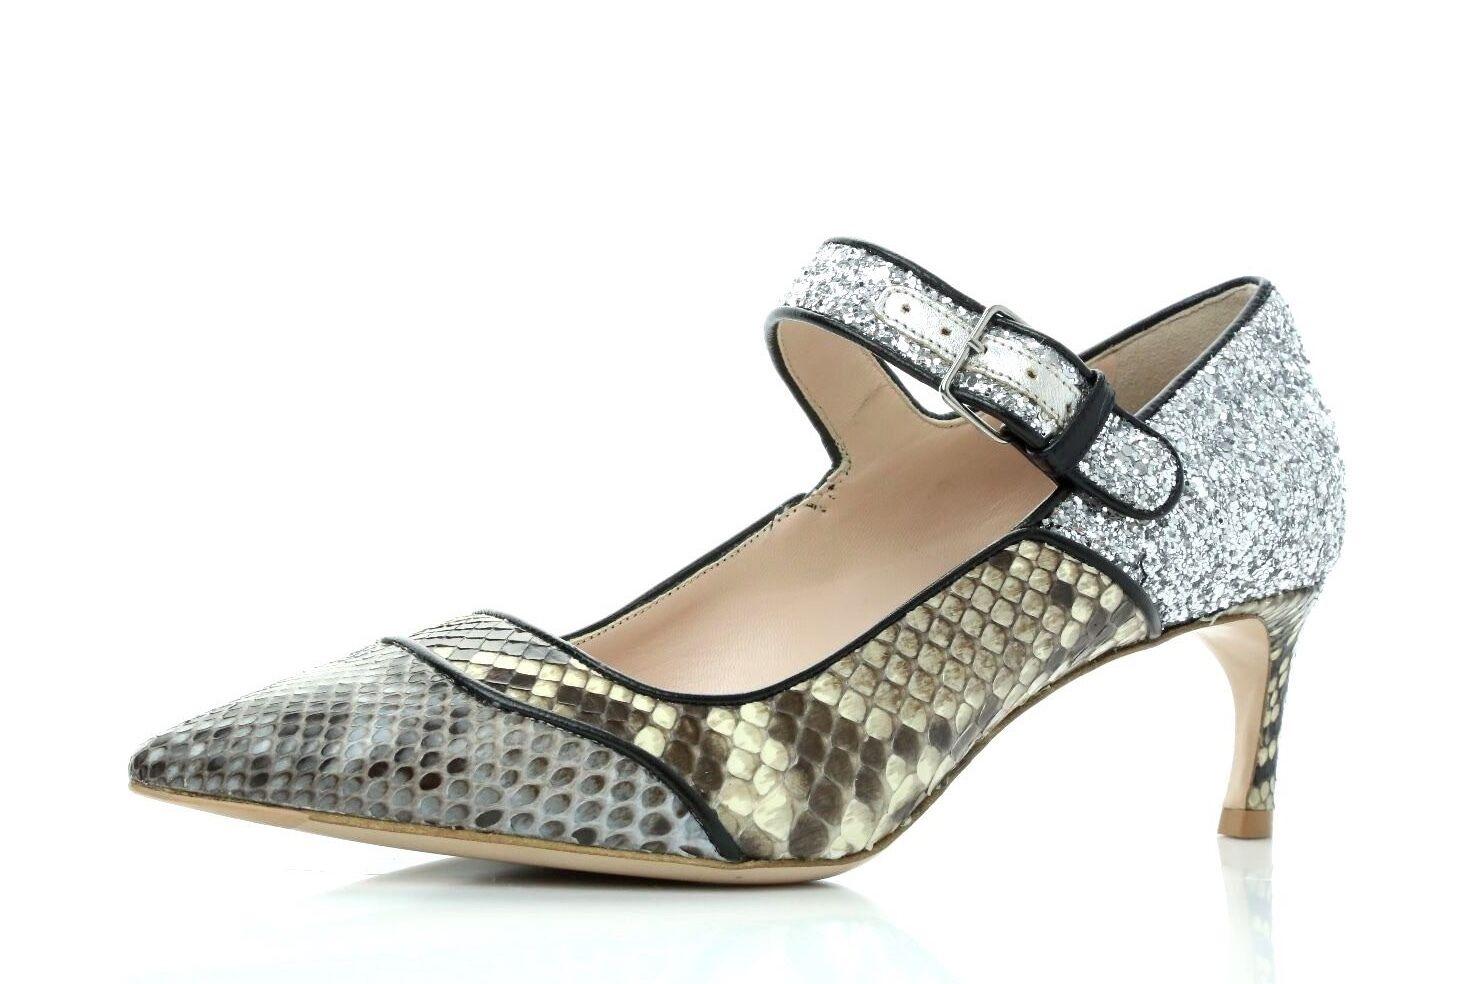 Miu Miu Glitter & Python Snake Leather Pointy Toe Mary Jane Pumps Heels Size 36